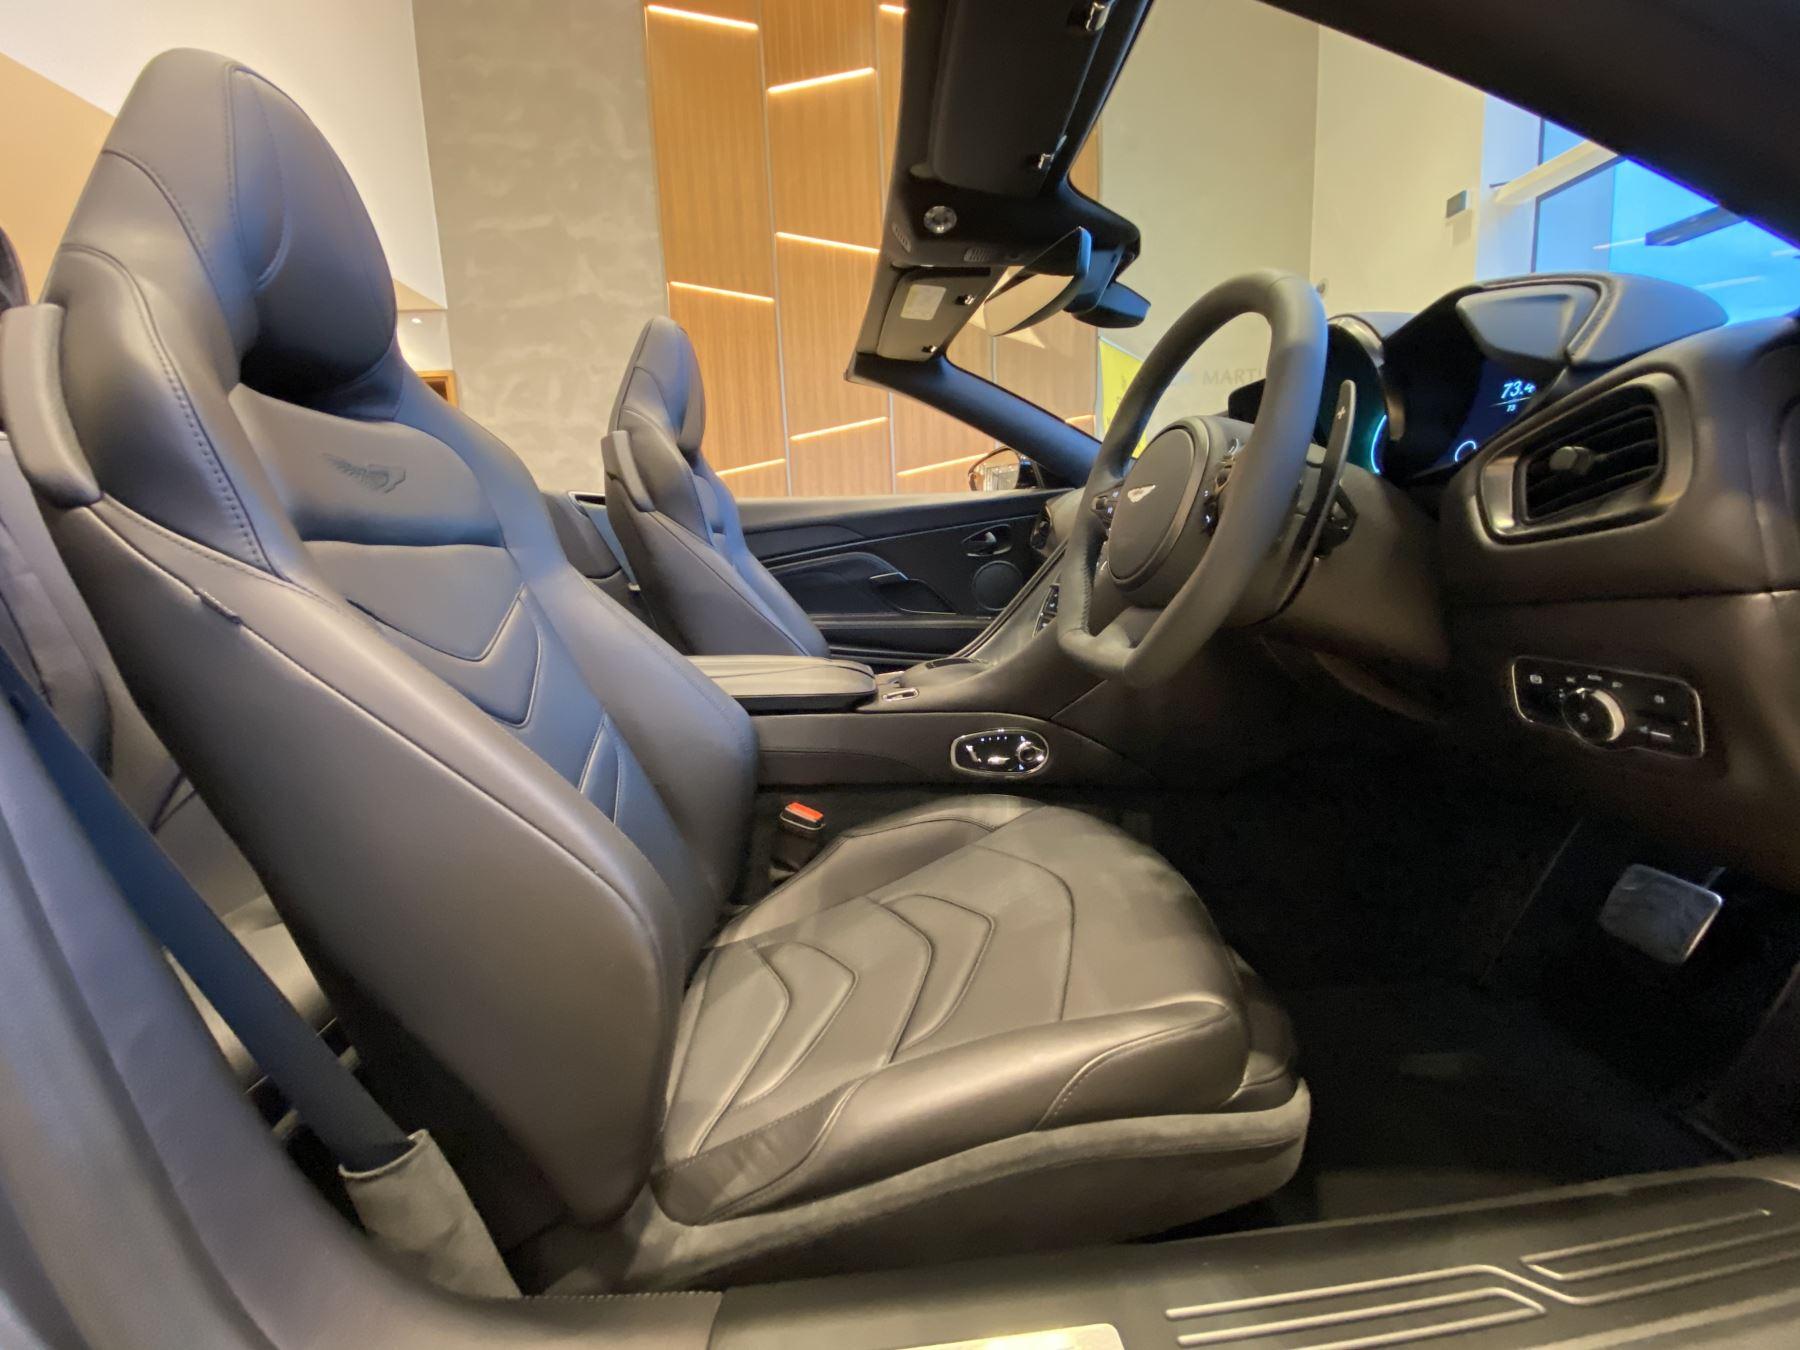 Aston Martin DBS V12 Superleggera Volante Touchtronic image 16